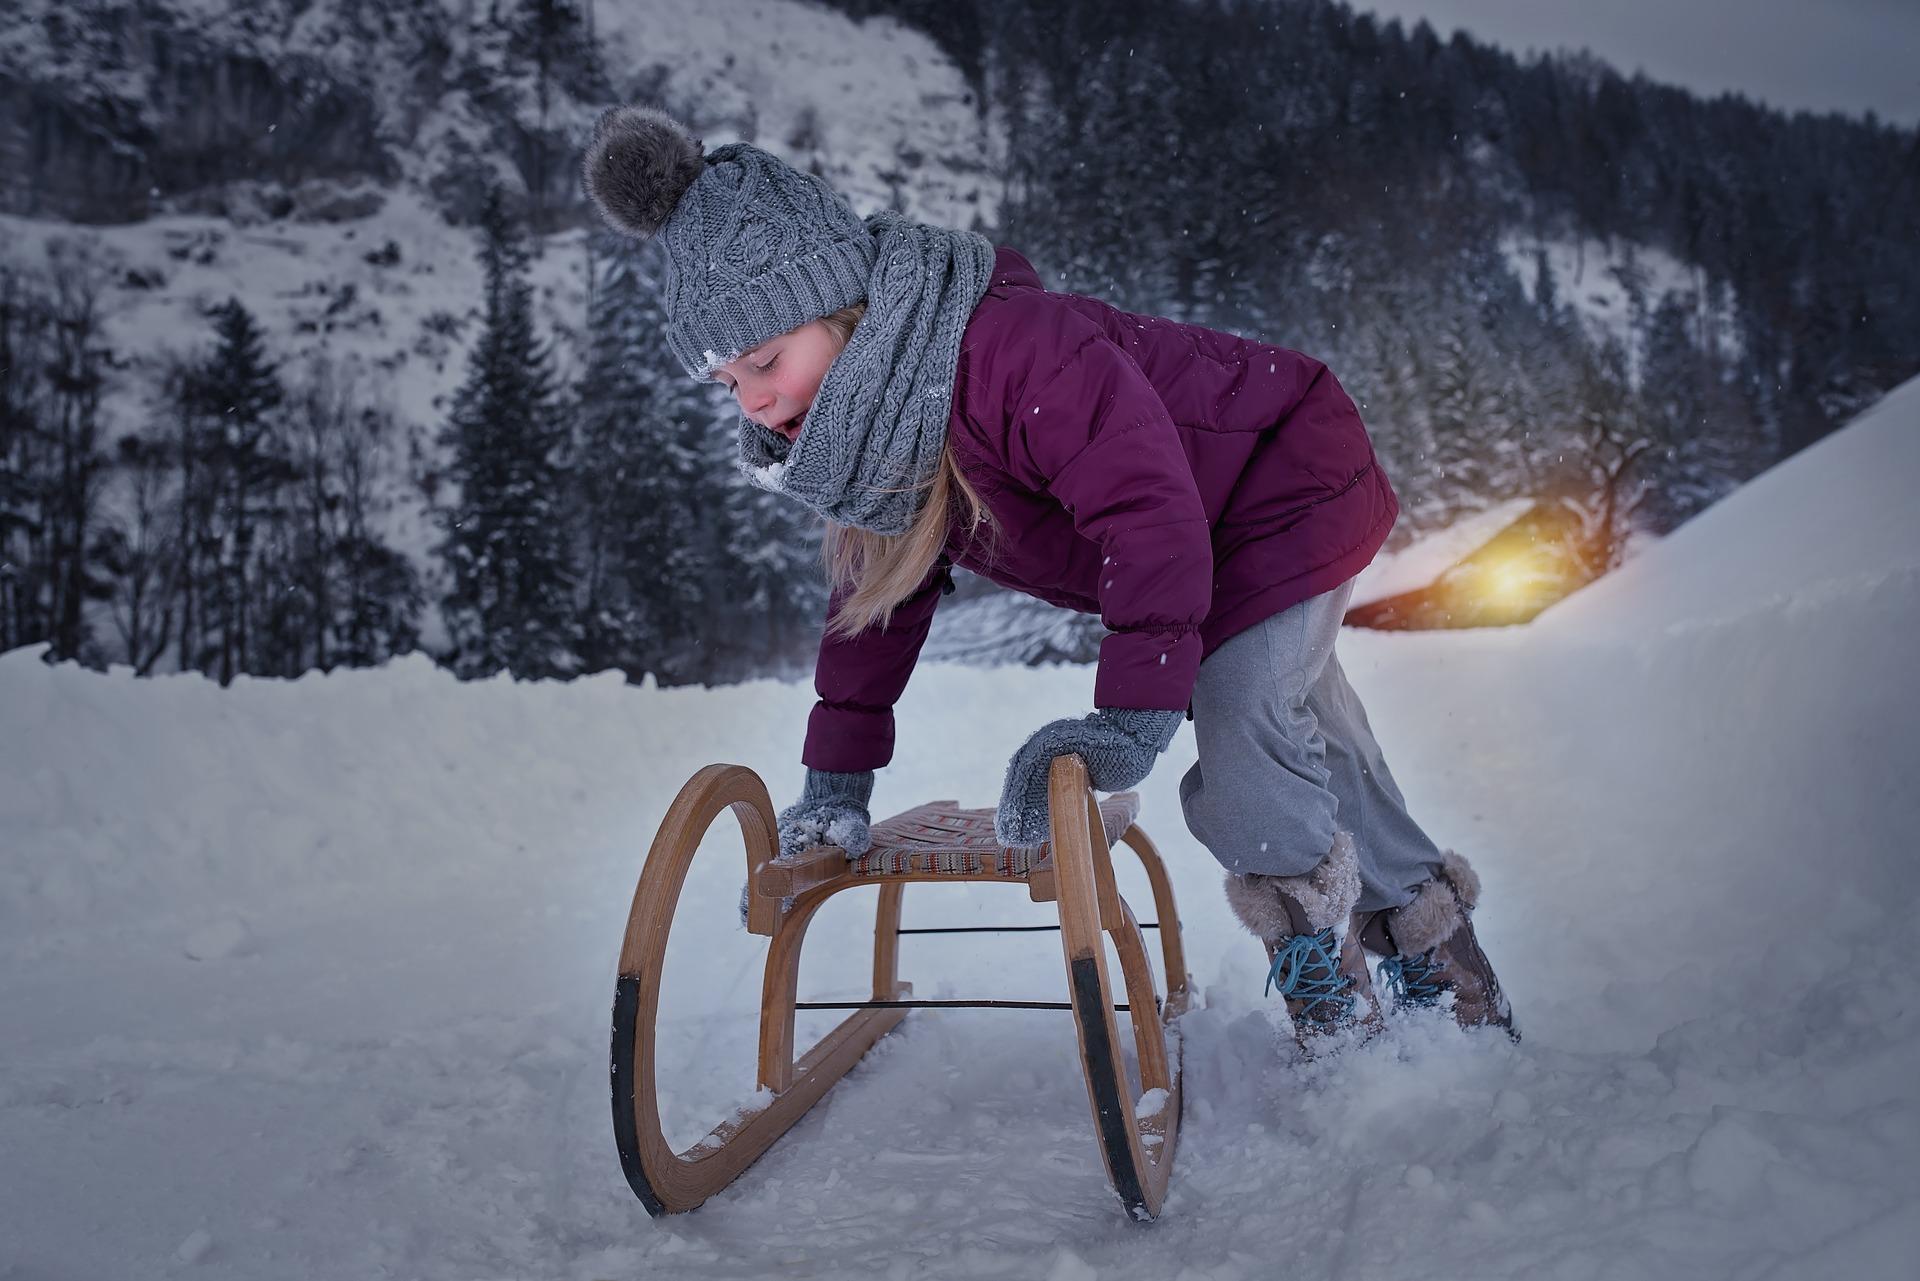 raceala la copii - raceala copii - sfatulparintilor.ro- pixabay_com